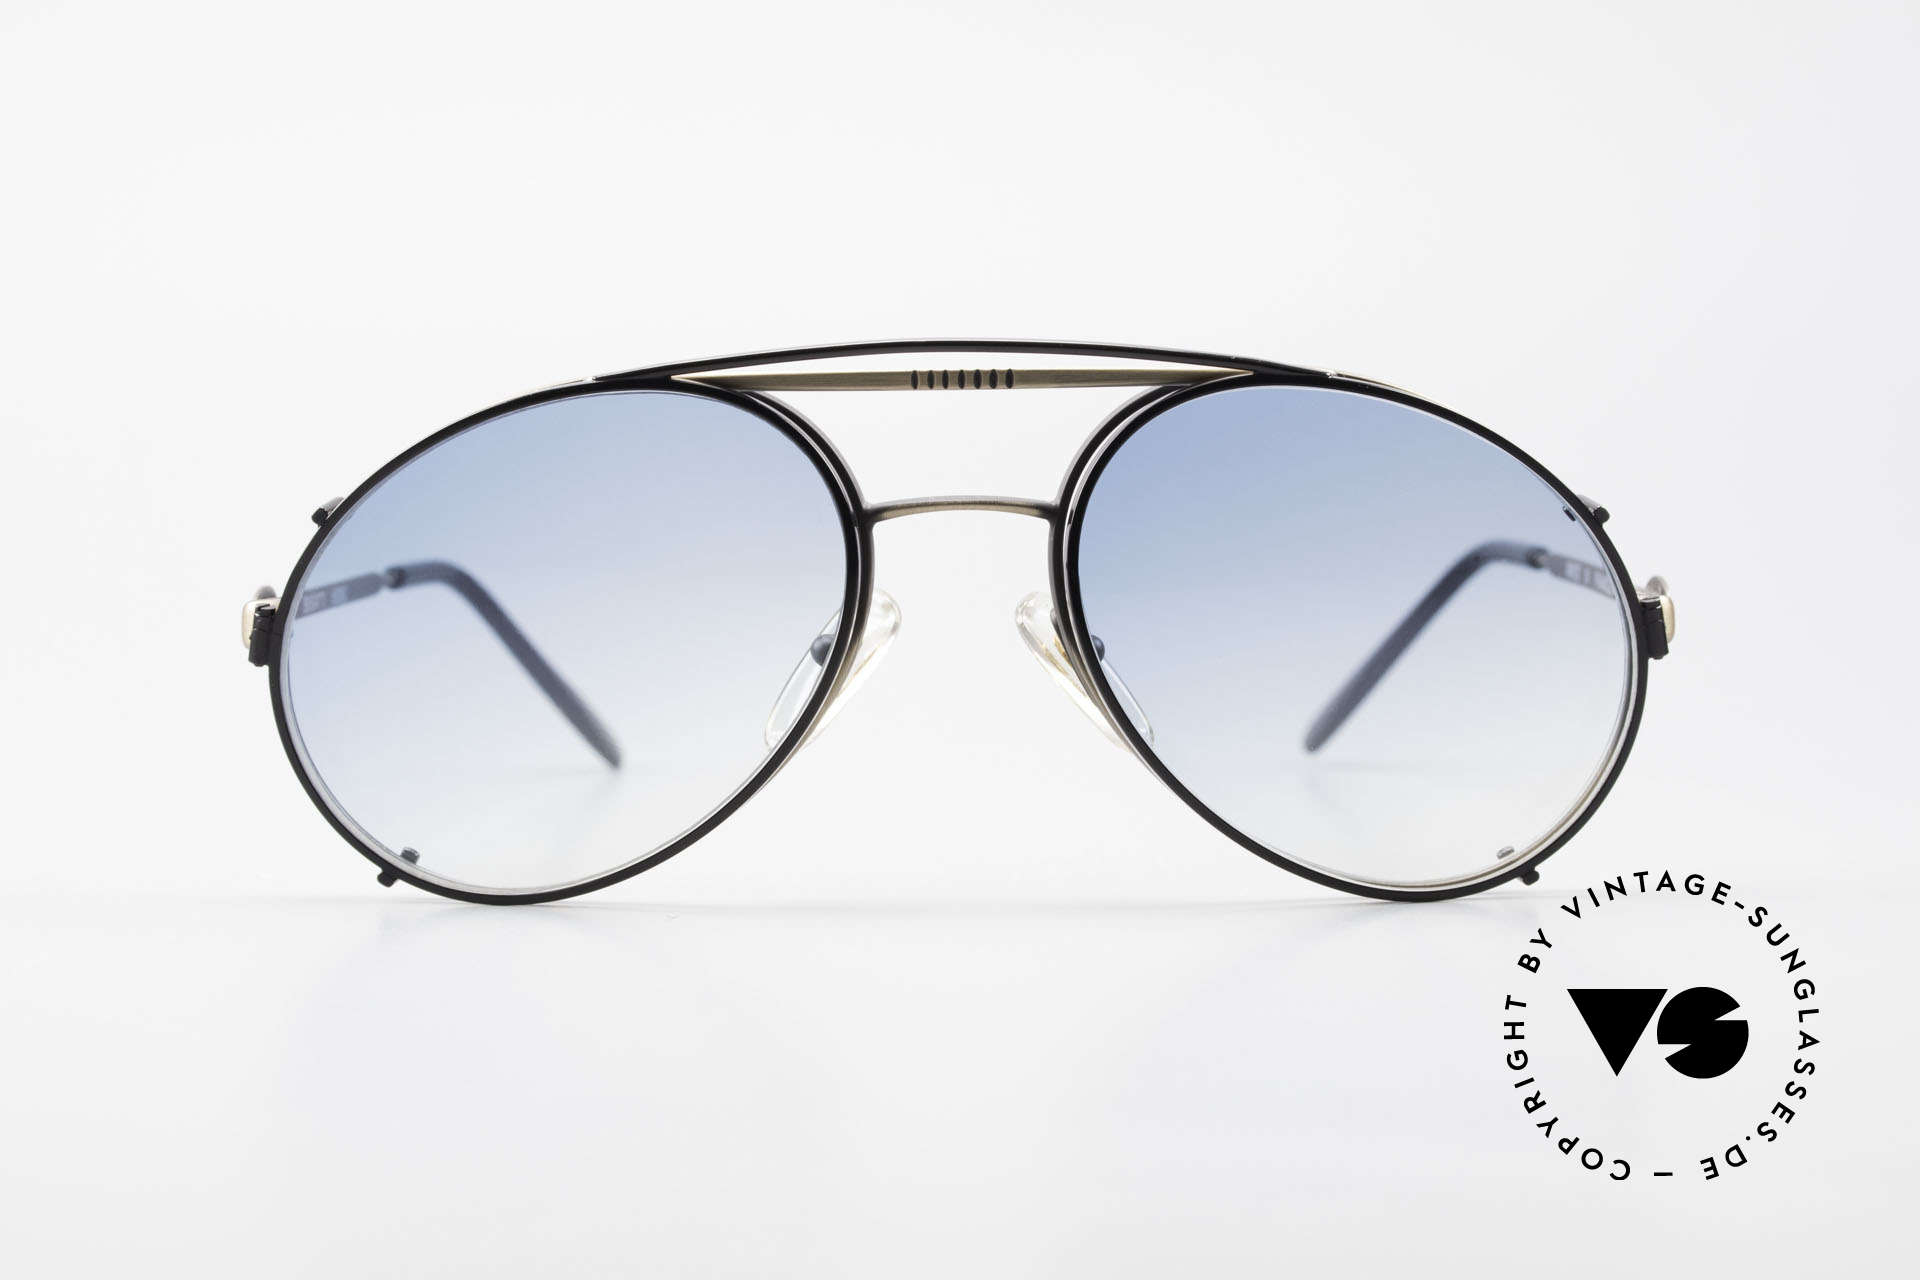 Bugatti 65282 Vintage Frame With Sun Clip, legendary vintage BUGATTI 'tear drop' design, Made for Men